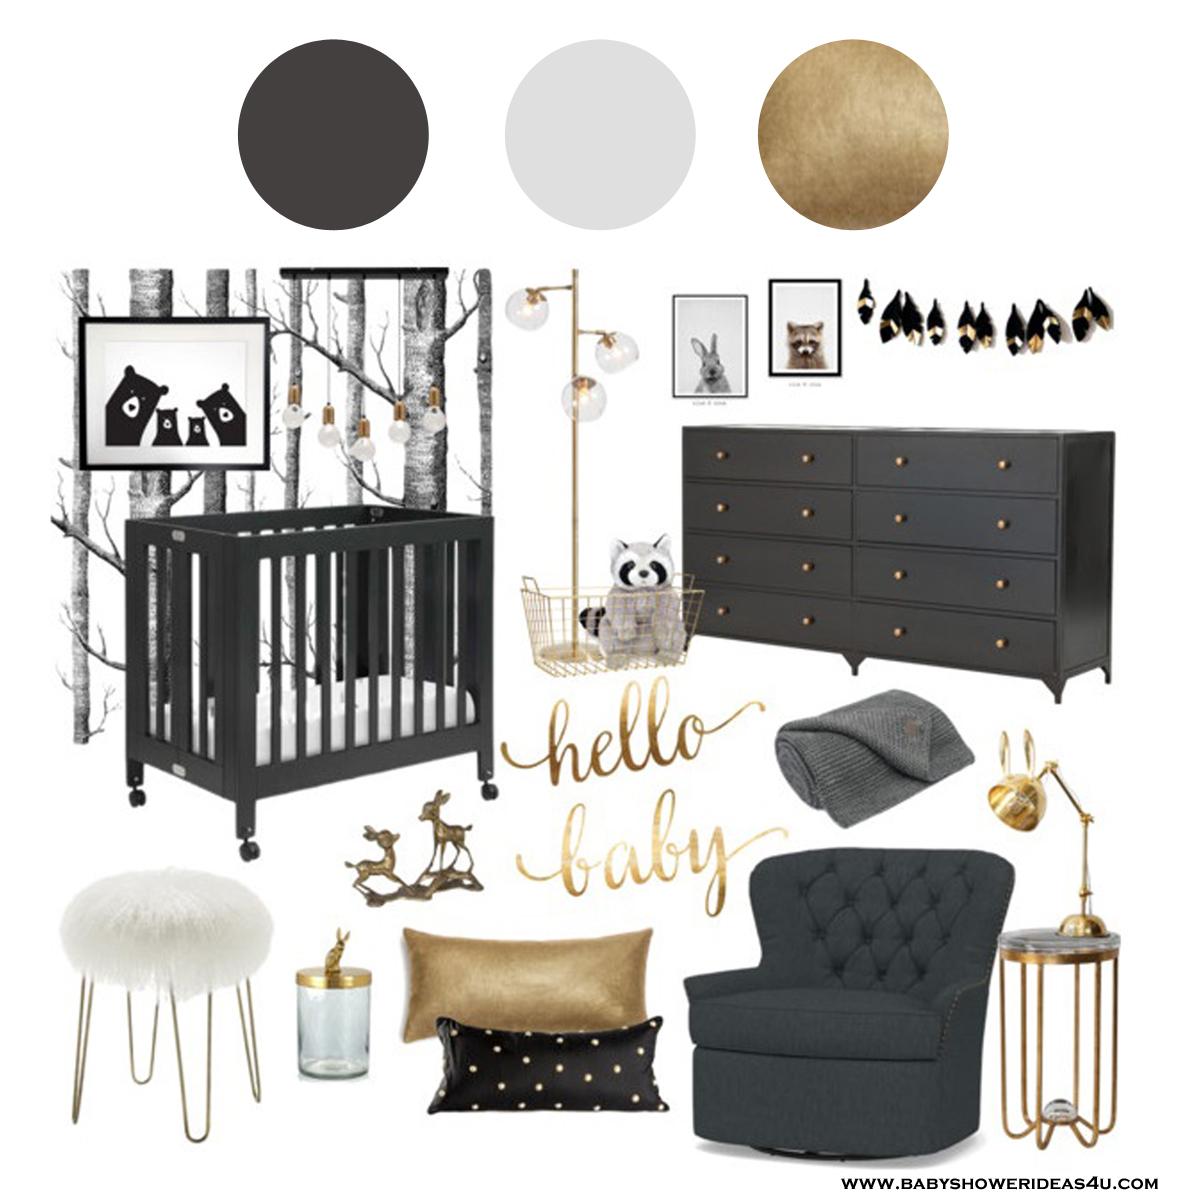 hello-baby-woodland-nursery-inspiration